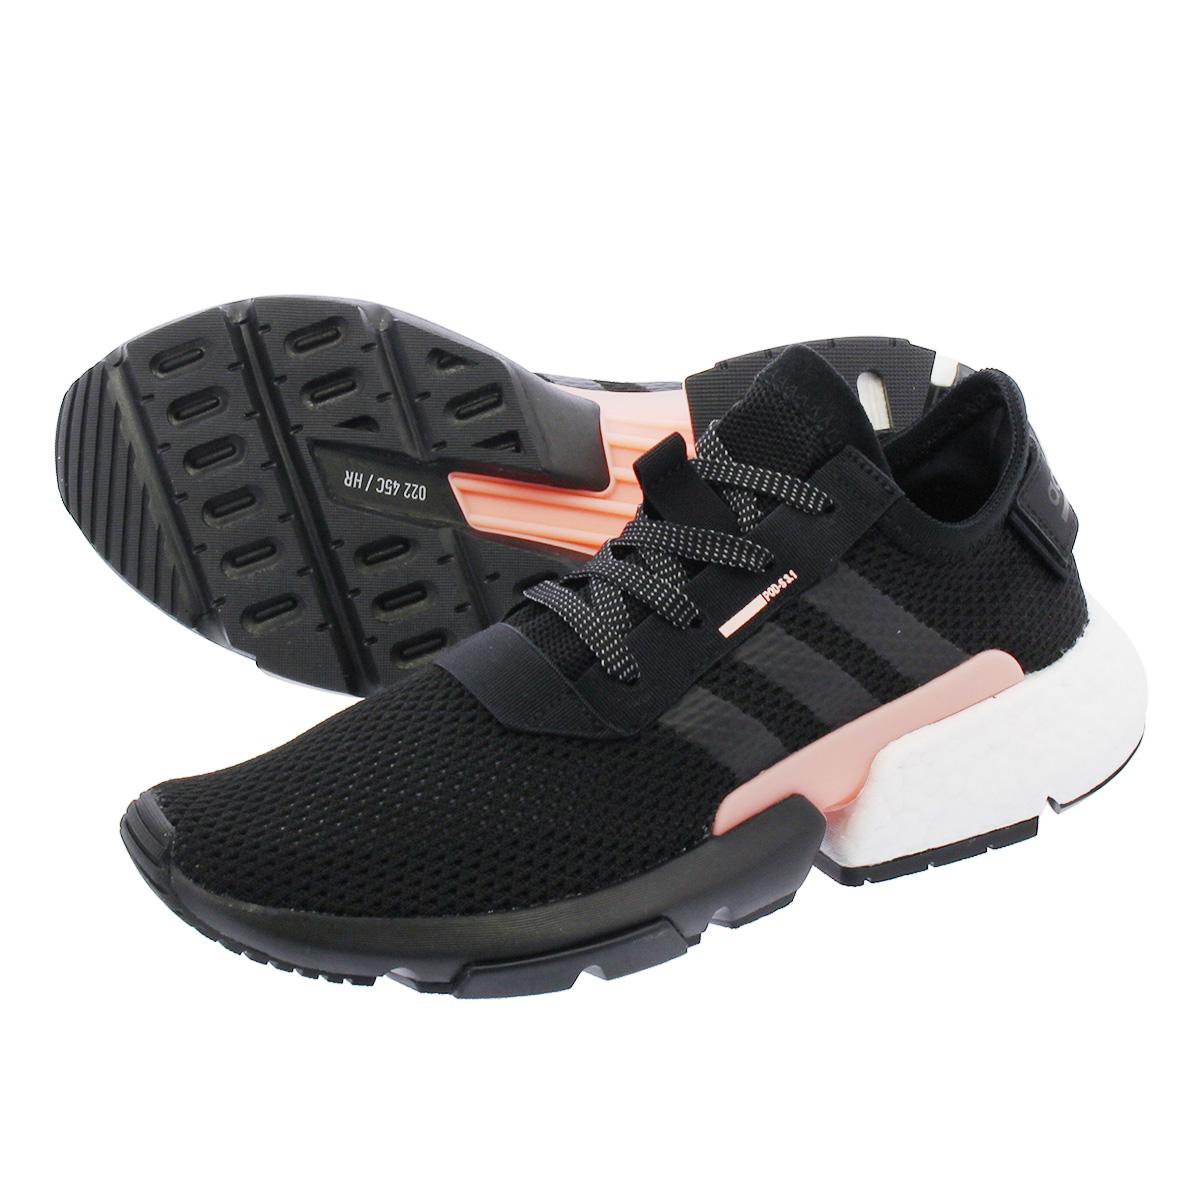 save off e9bdb f9cef LOWTEX PLUS adidas POD-S3.1 Adidas POD-S3.1 CORE BLACKCORE BLACKCLEAR  ORANGE b37447  Rakuten Global Market